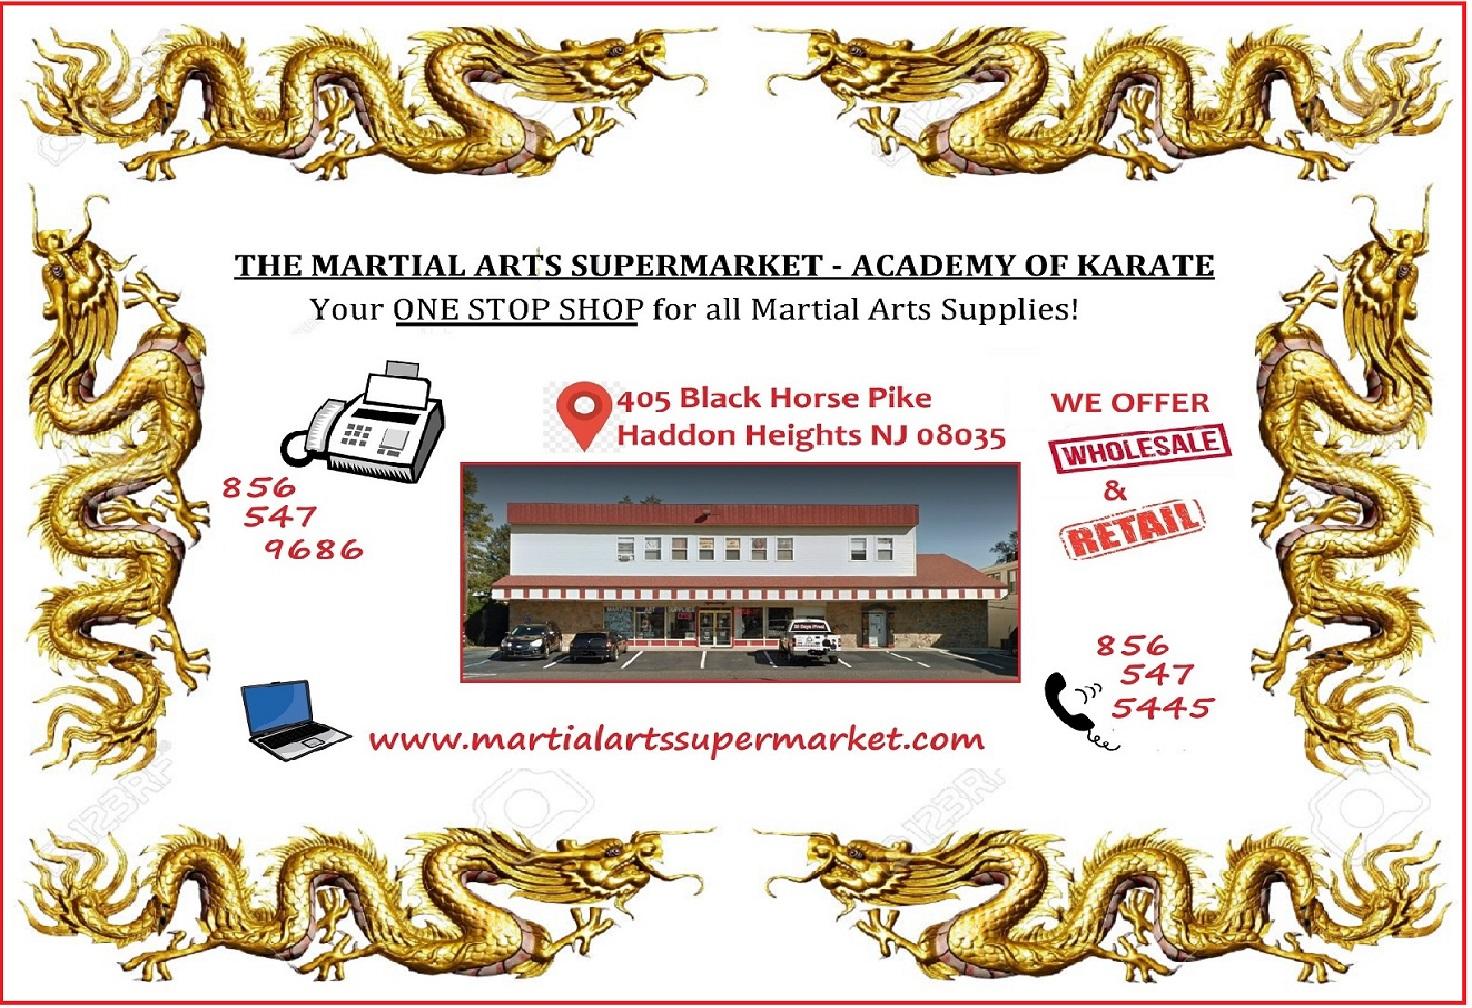 35caf7e580c Academy Of Karate - Martial Arts Supply Inc. - The Martial Arts ...